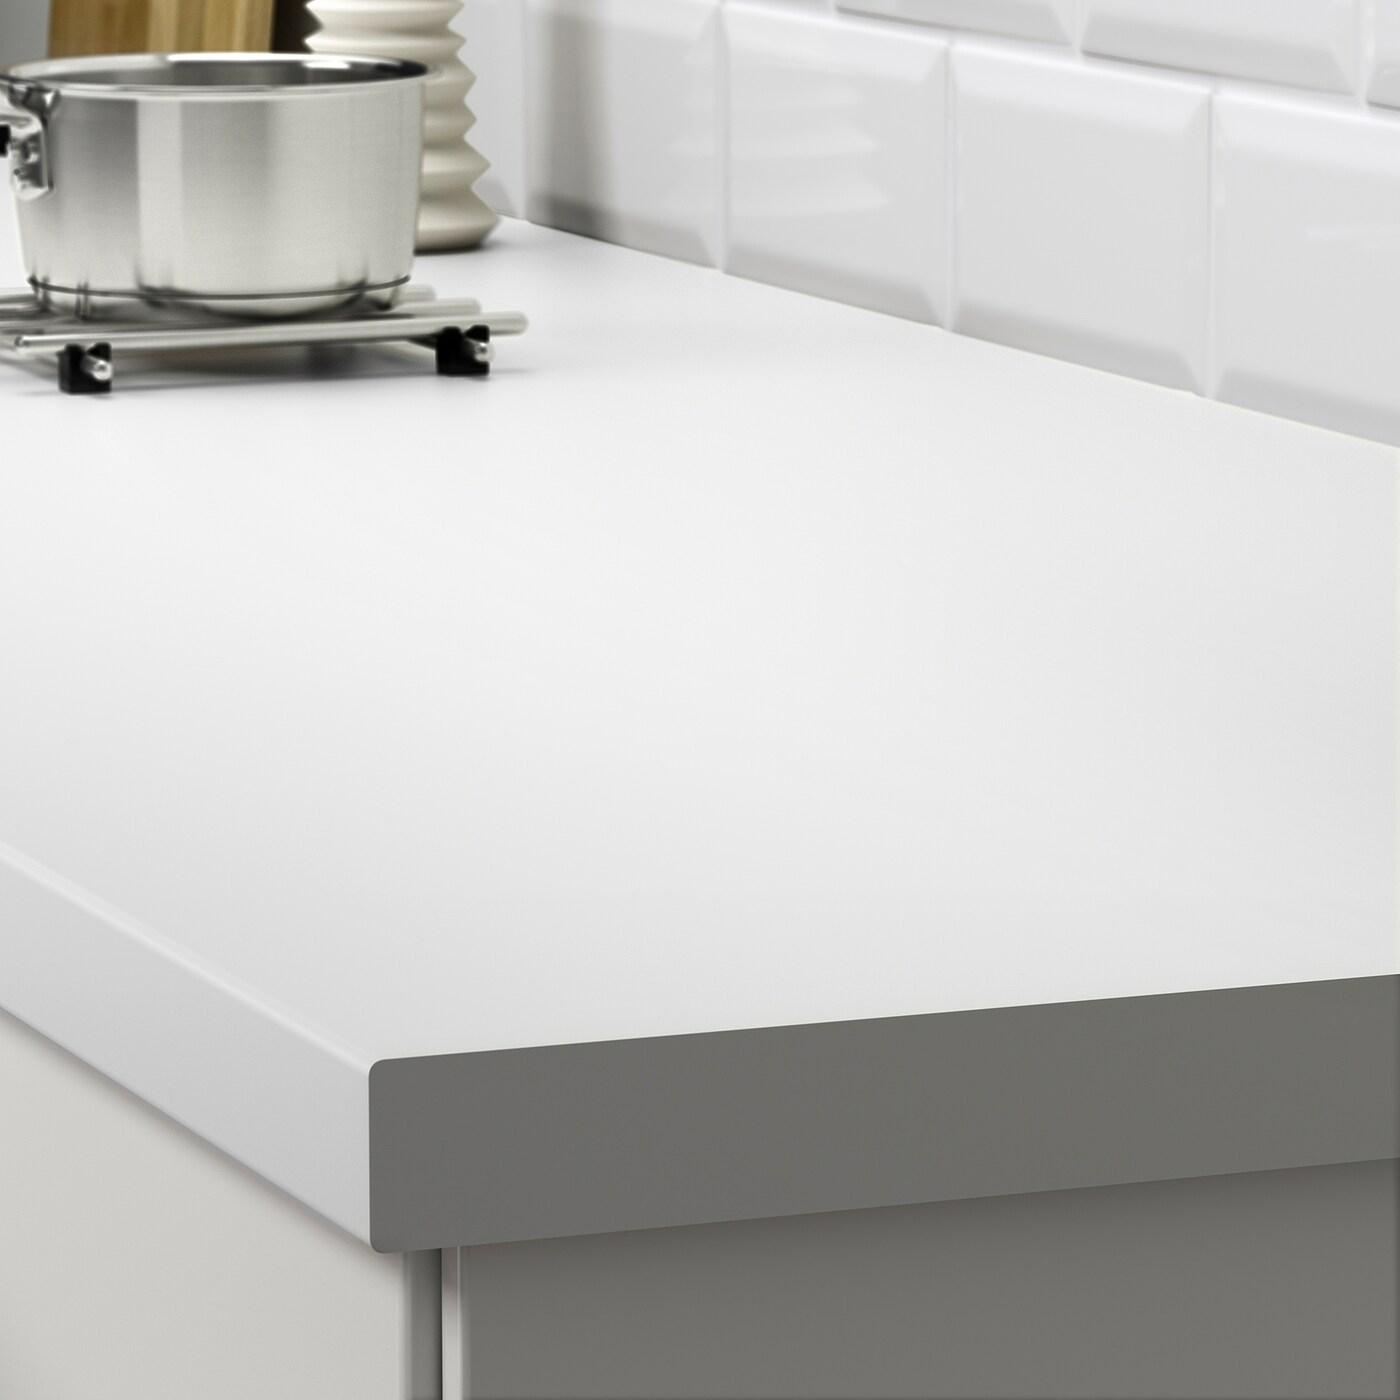 Saljan Werkblad Wit Laminaat 246x3 8 Cm Ikea